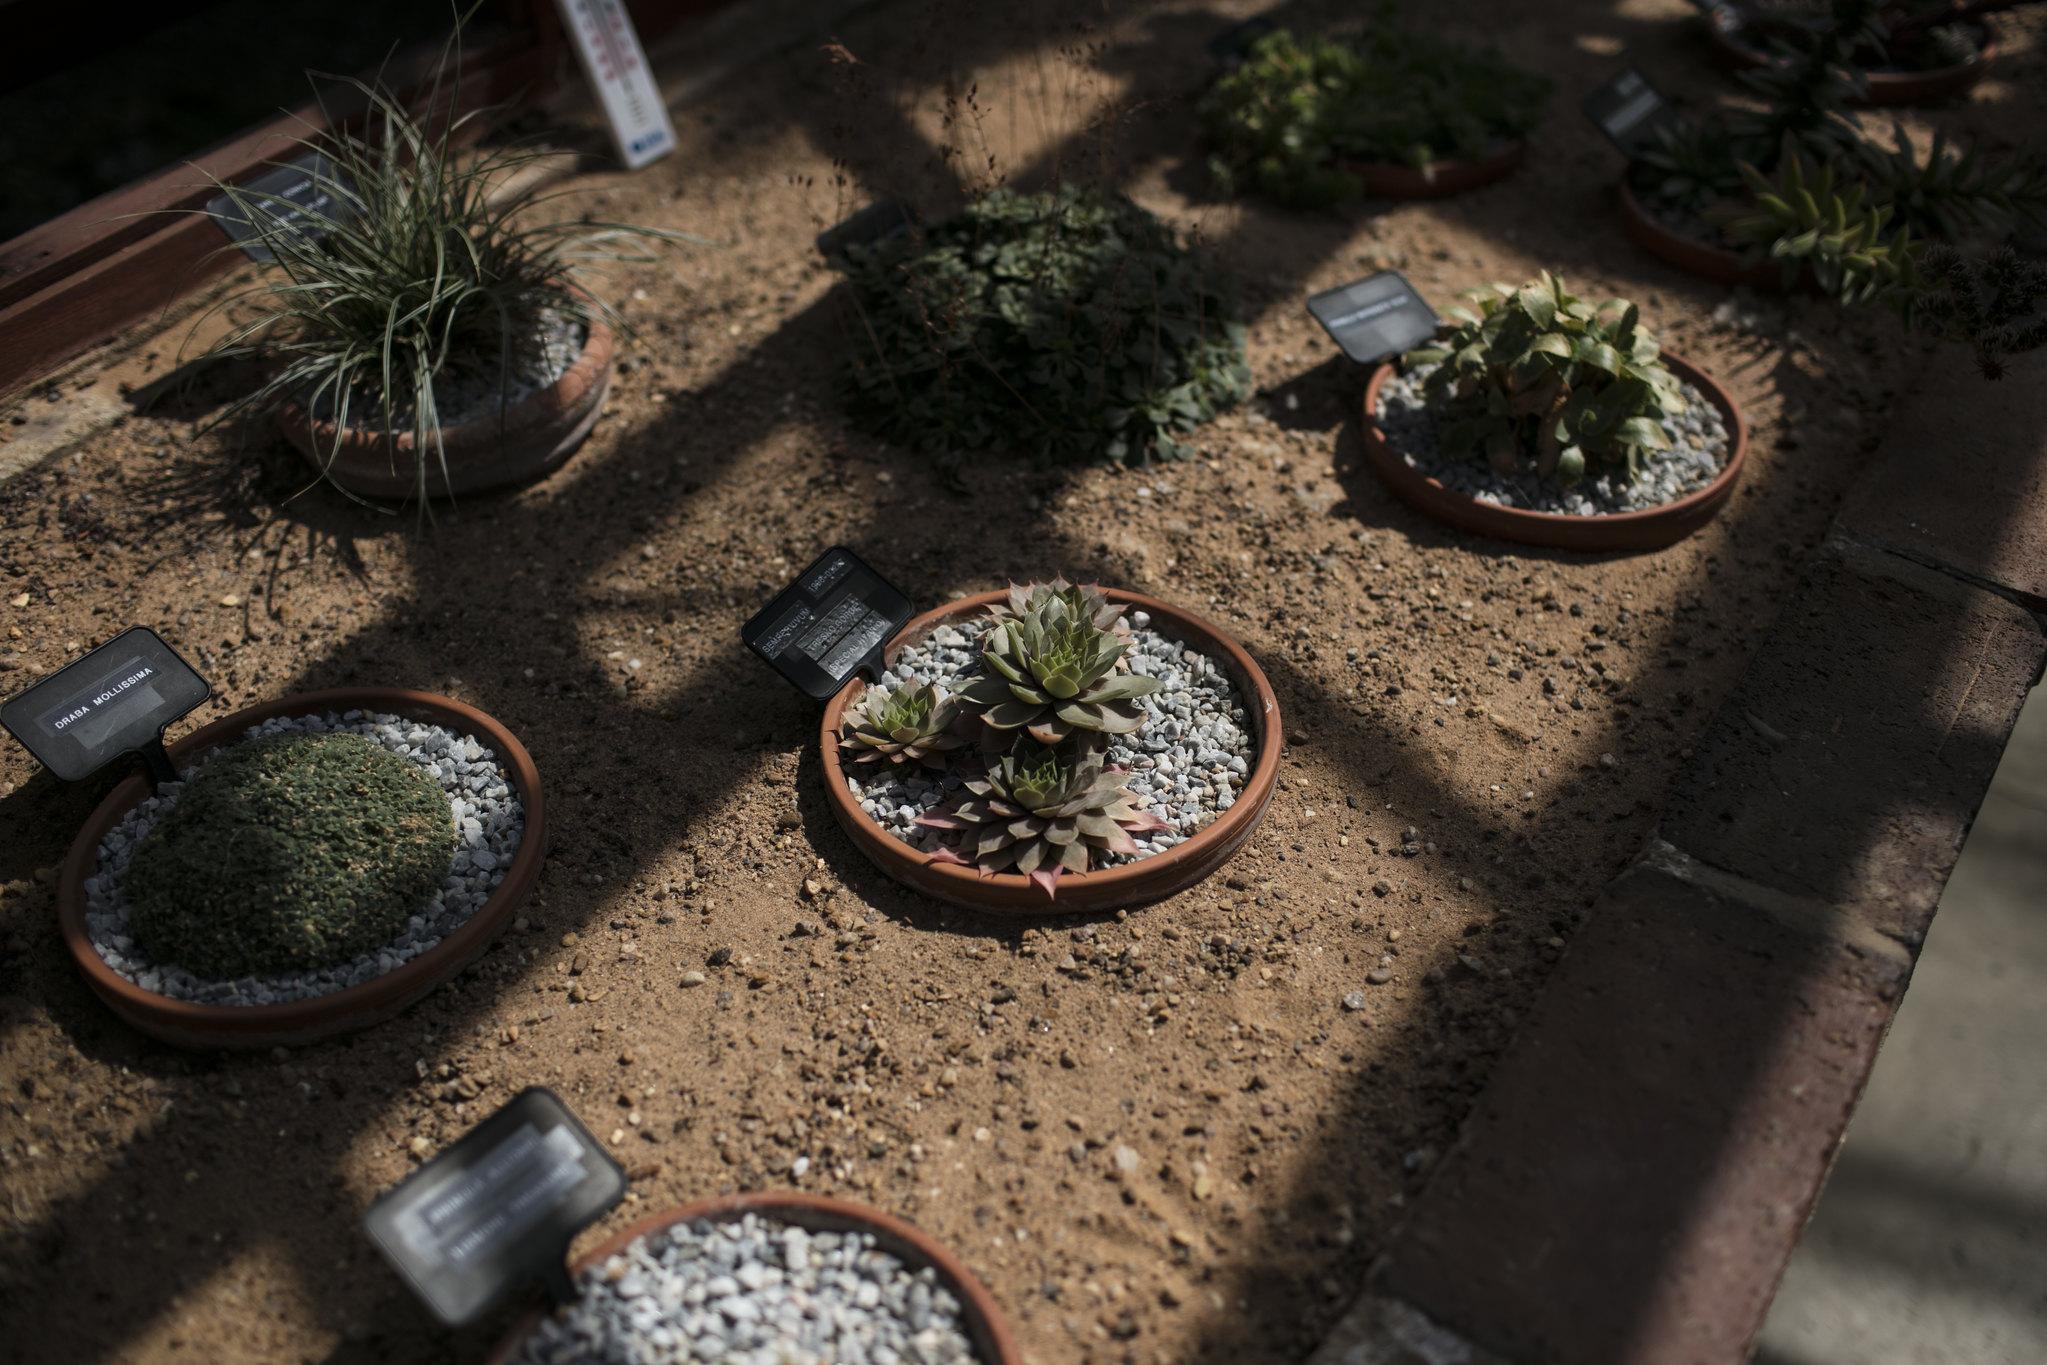 Jordan_Bunker_botanical_gardens_9